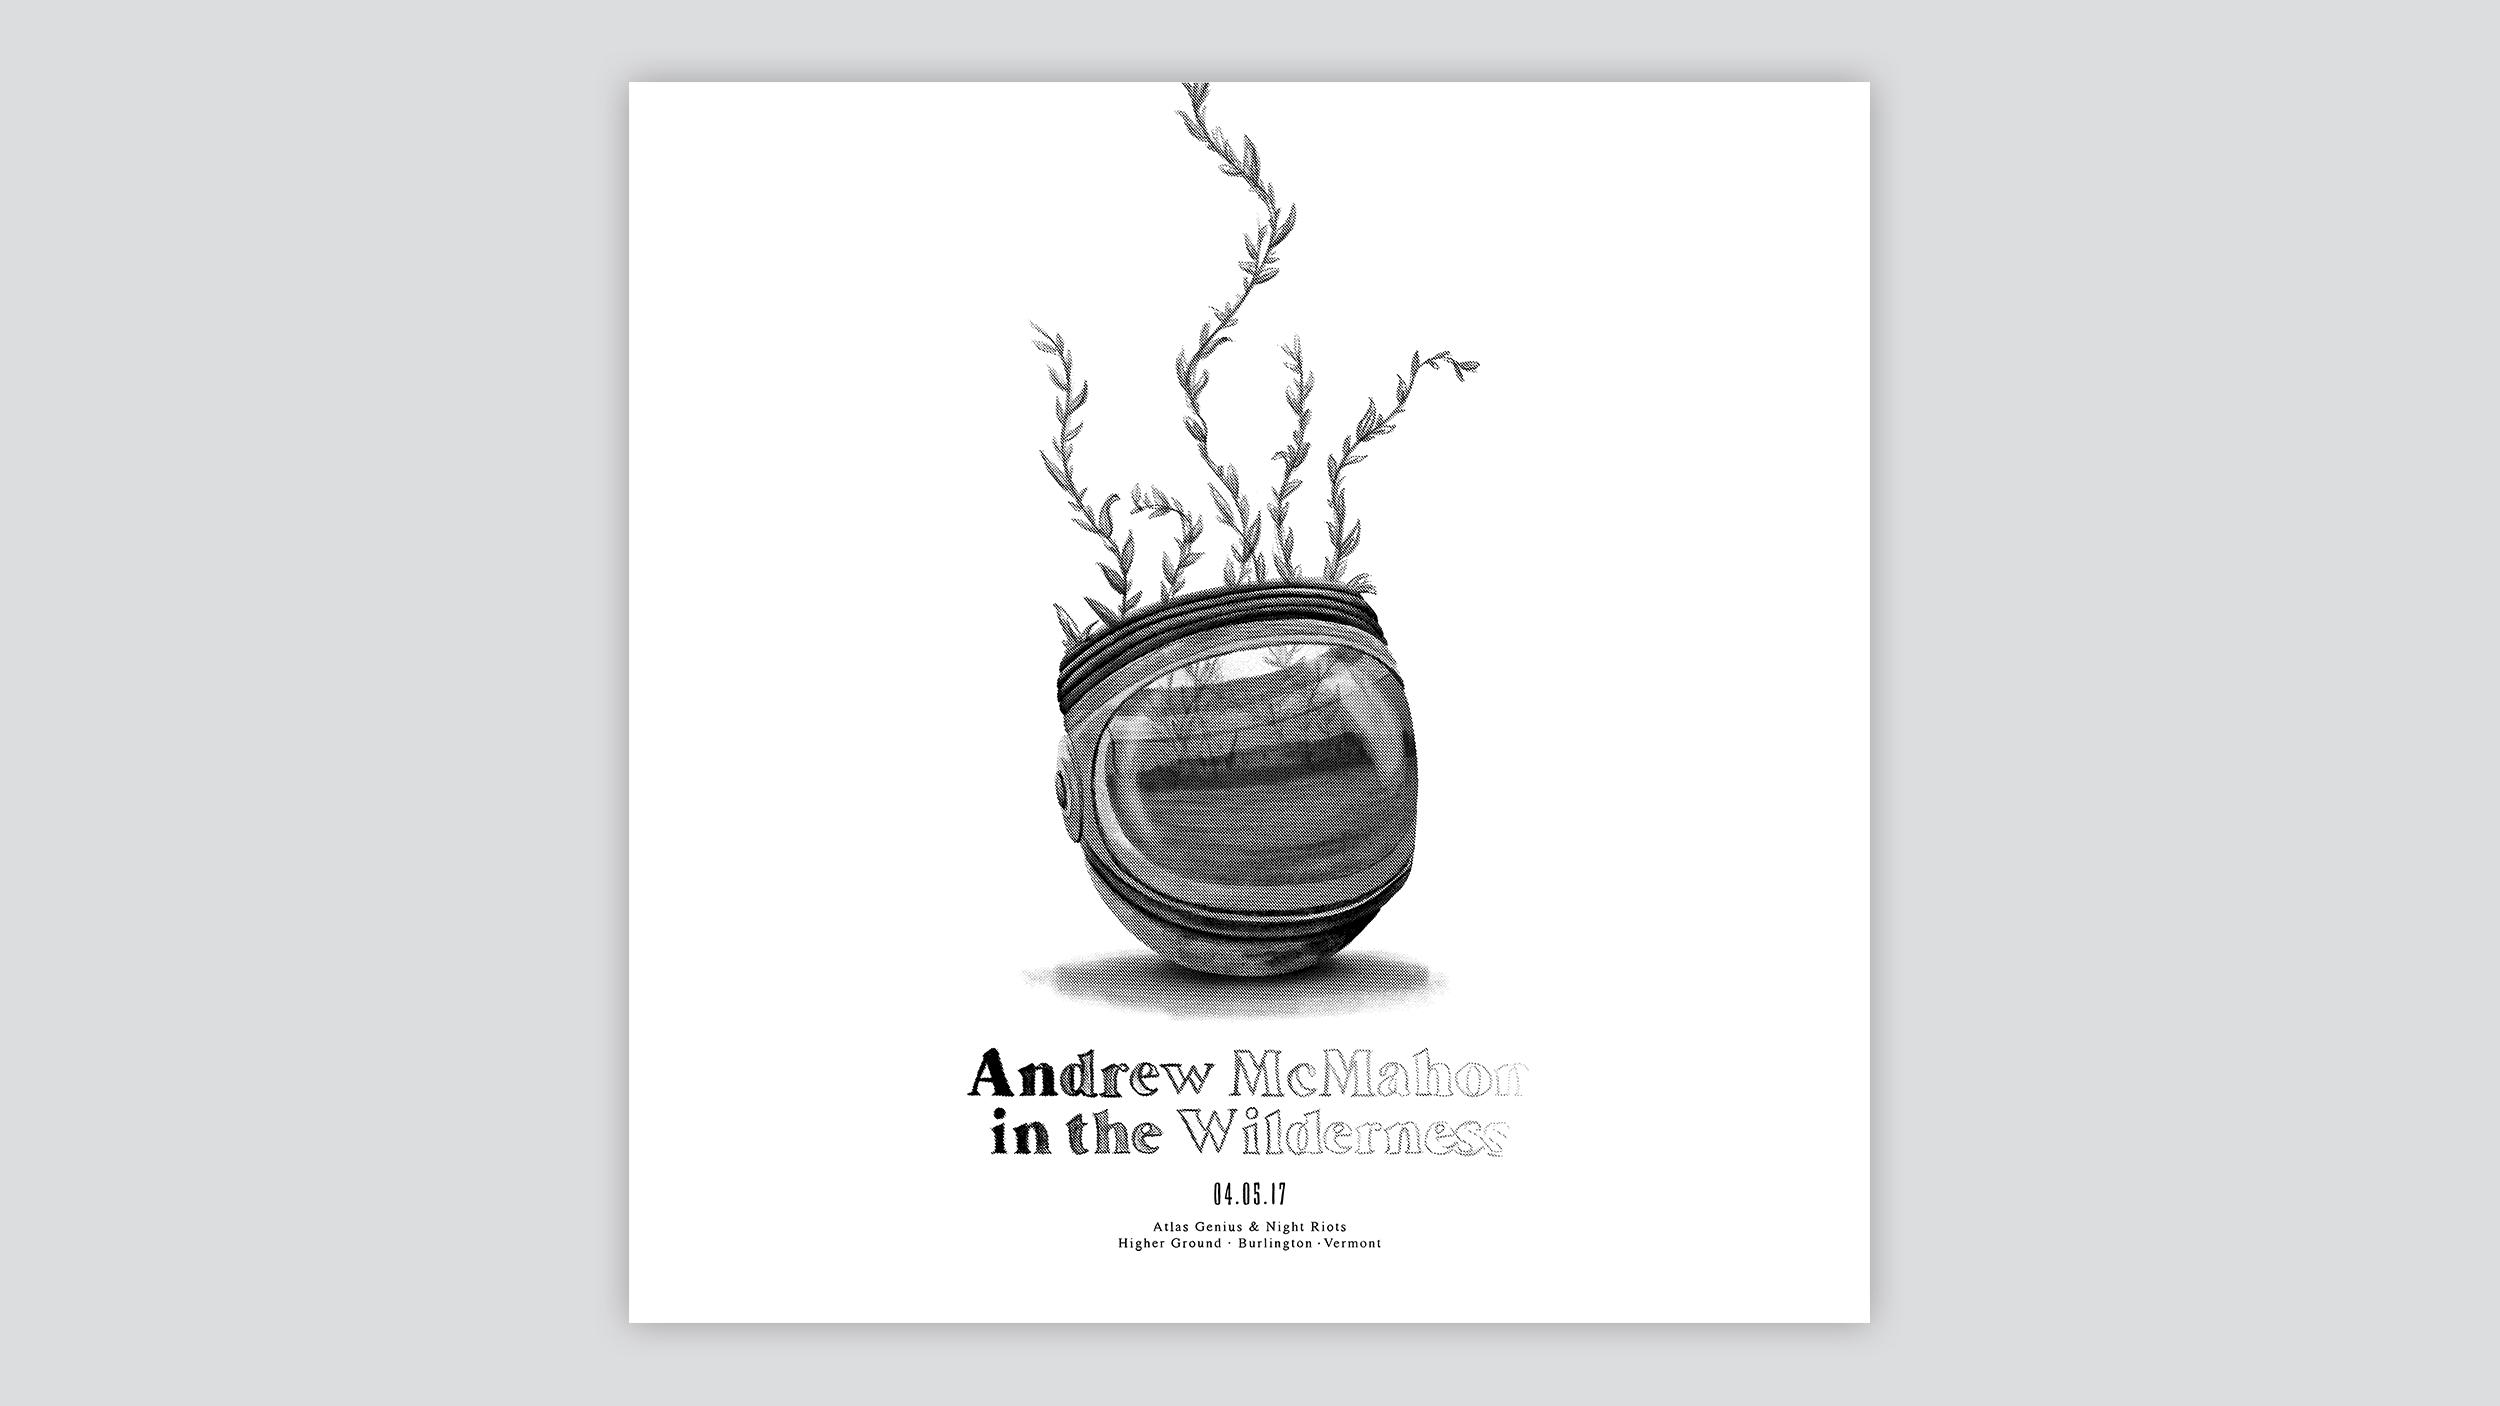 AndrewMcMahon_Wide.jpg